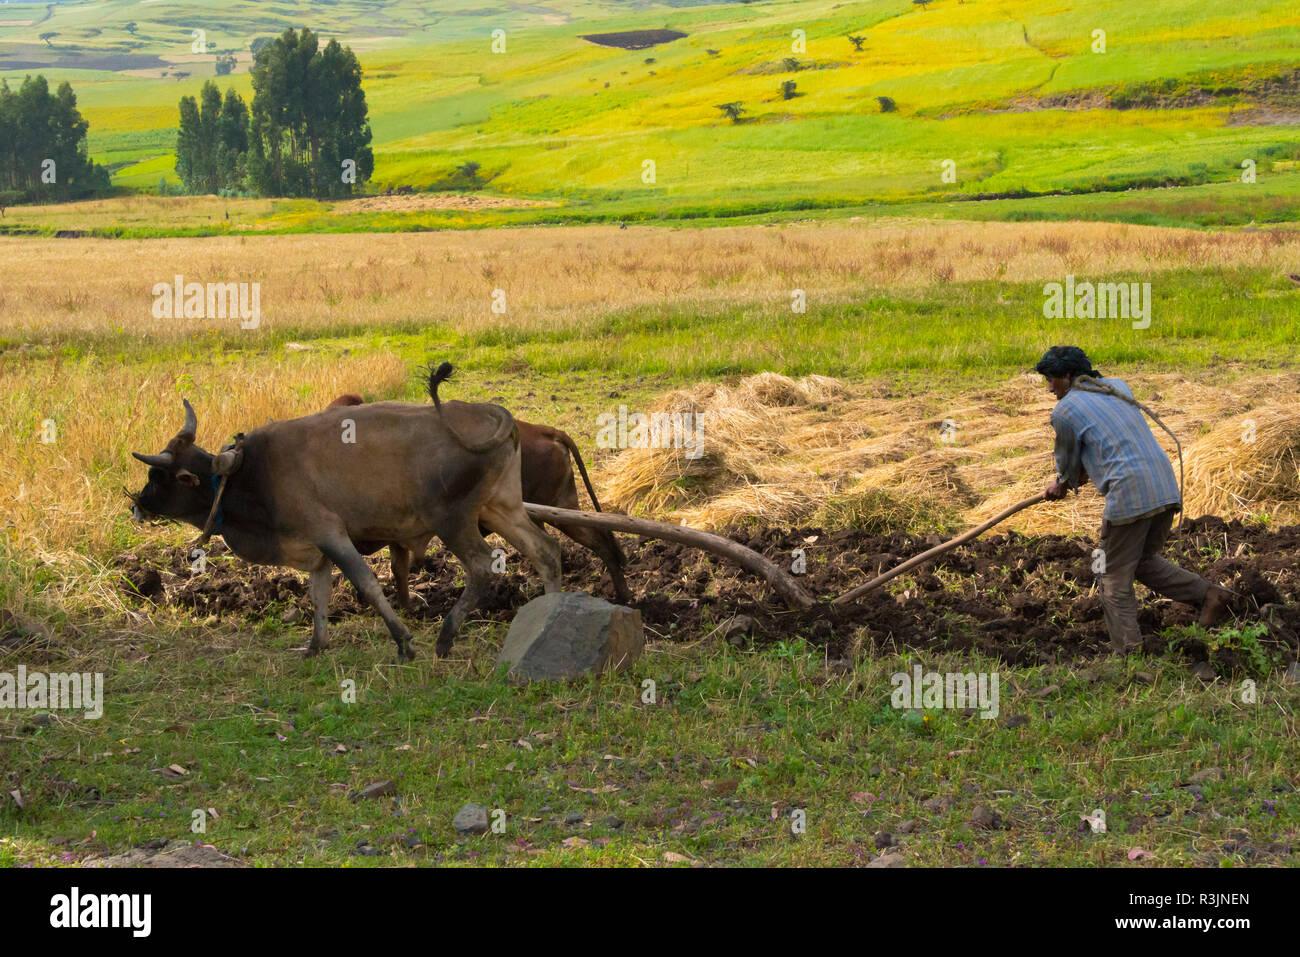 Farmer plough with cow in the farmland, Gondar, Ethiopia - Stock Image